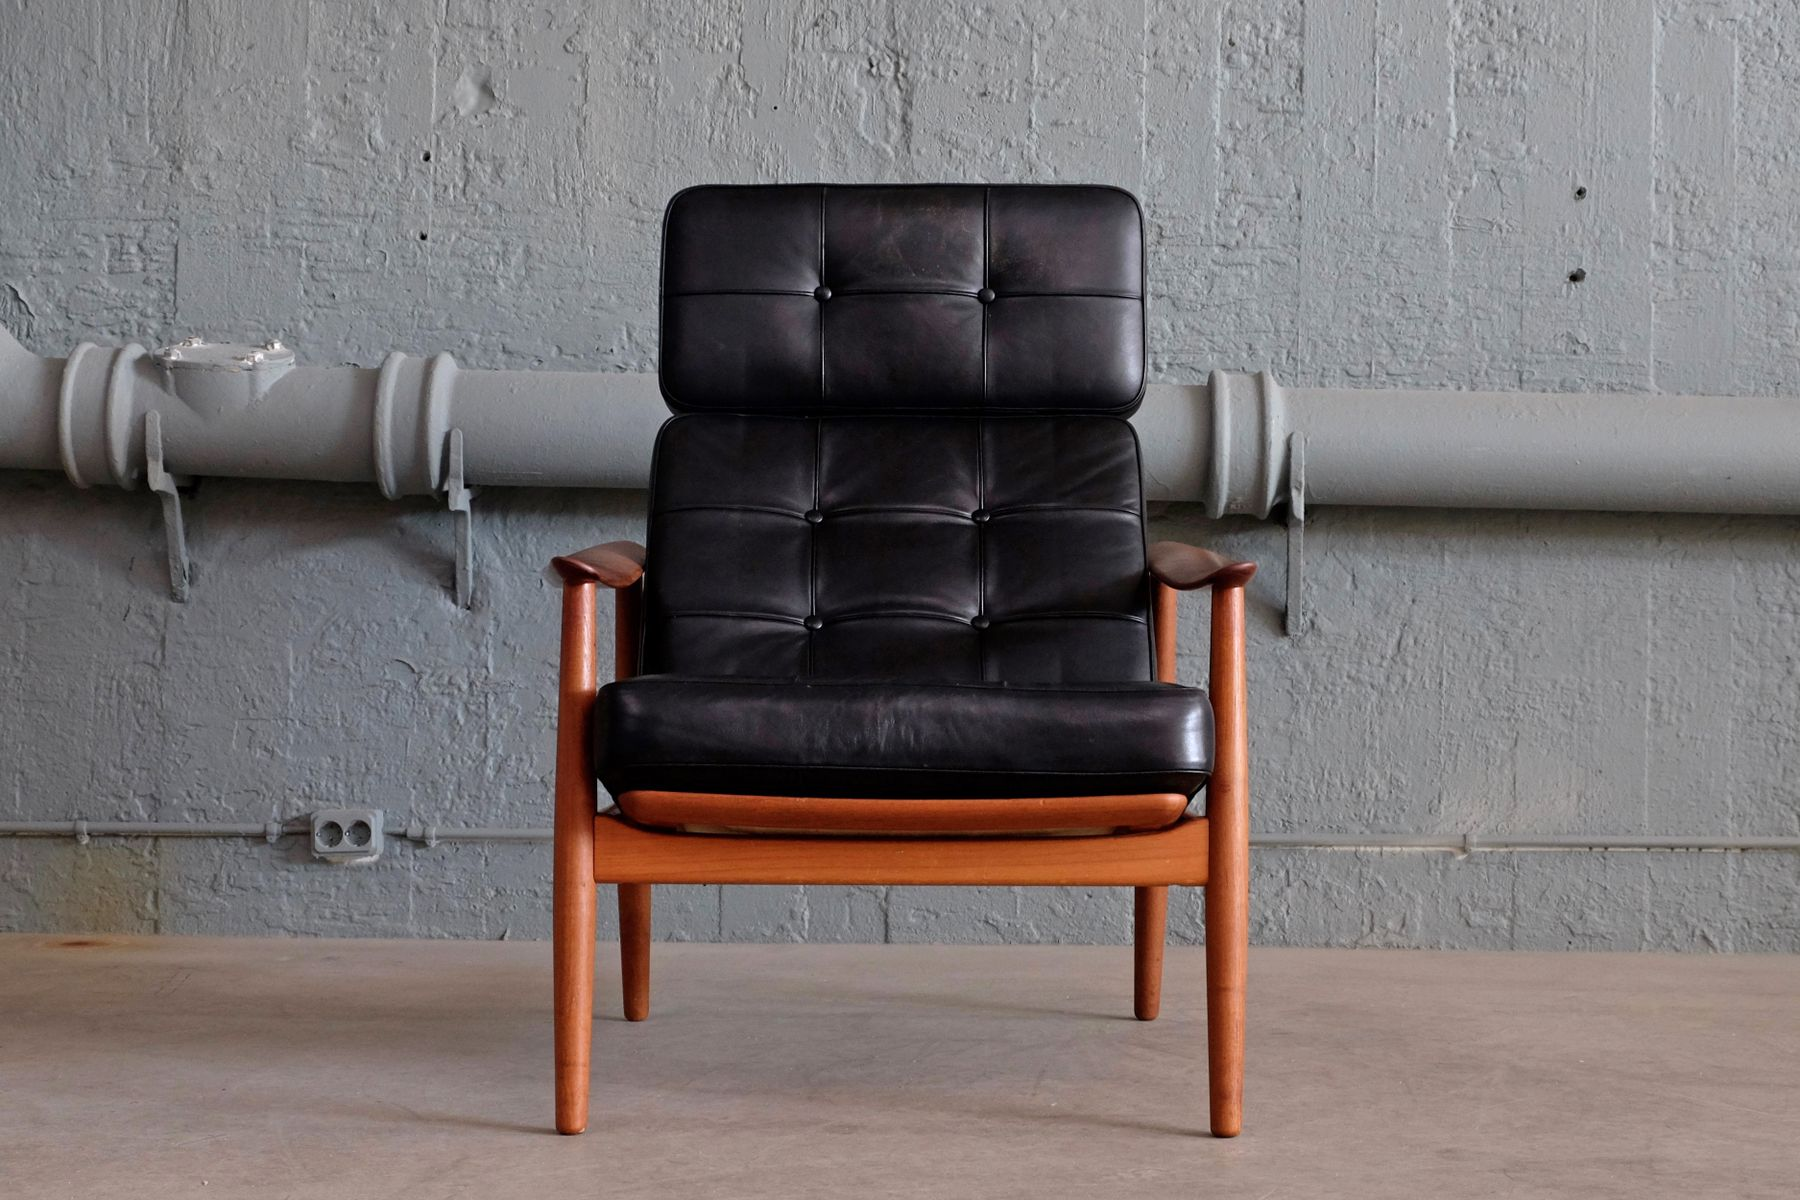 Modell FD-164 Sessel von Arne Vodder für France & Son, 1960er